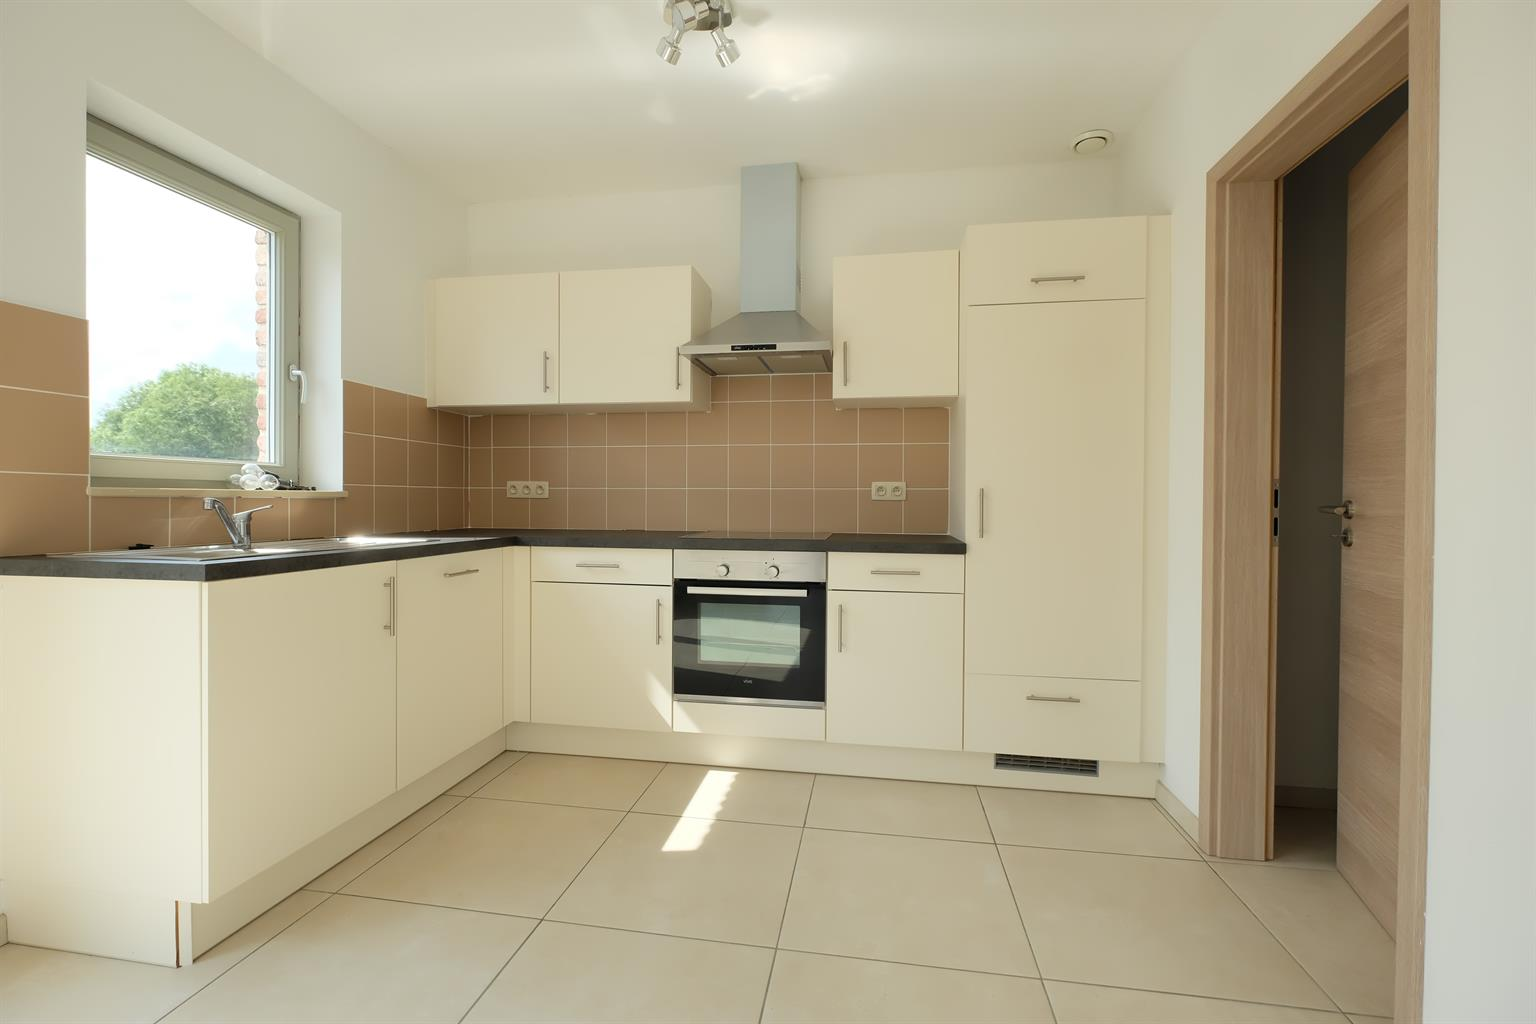 Appartement - Soignies - #4223150-3